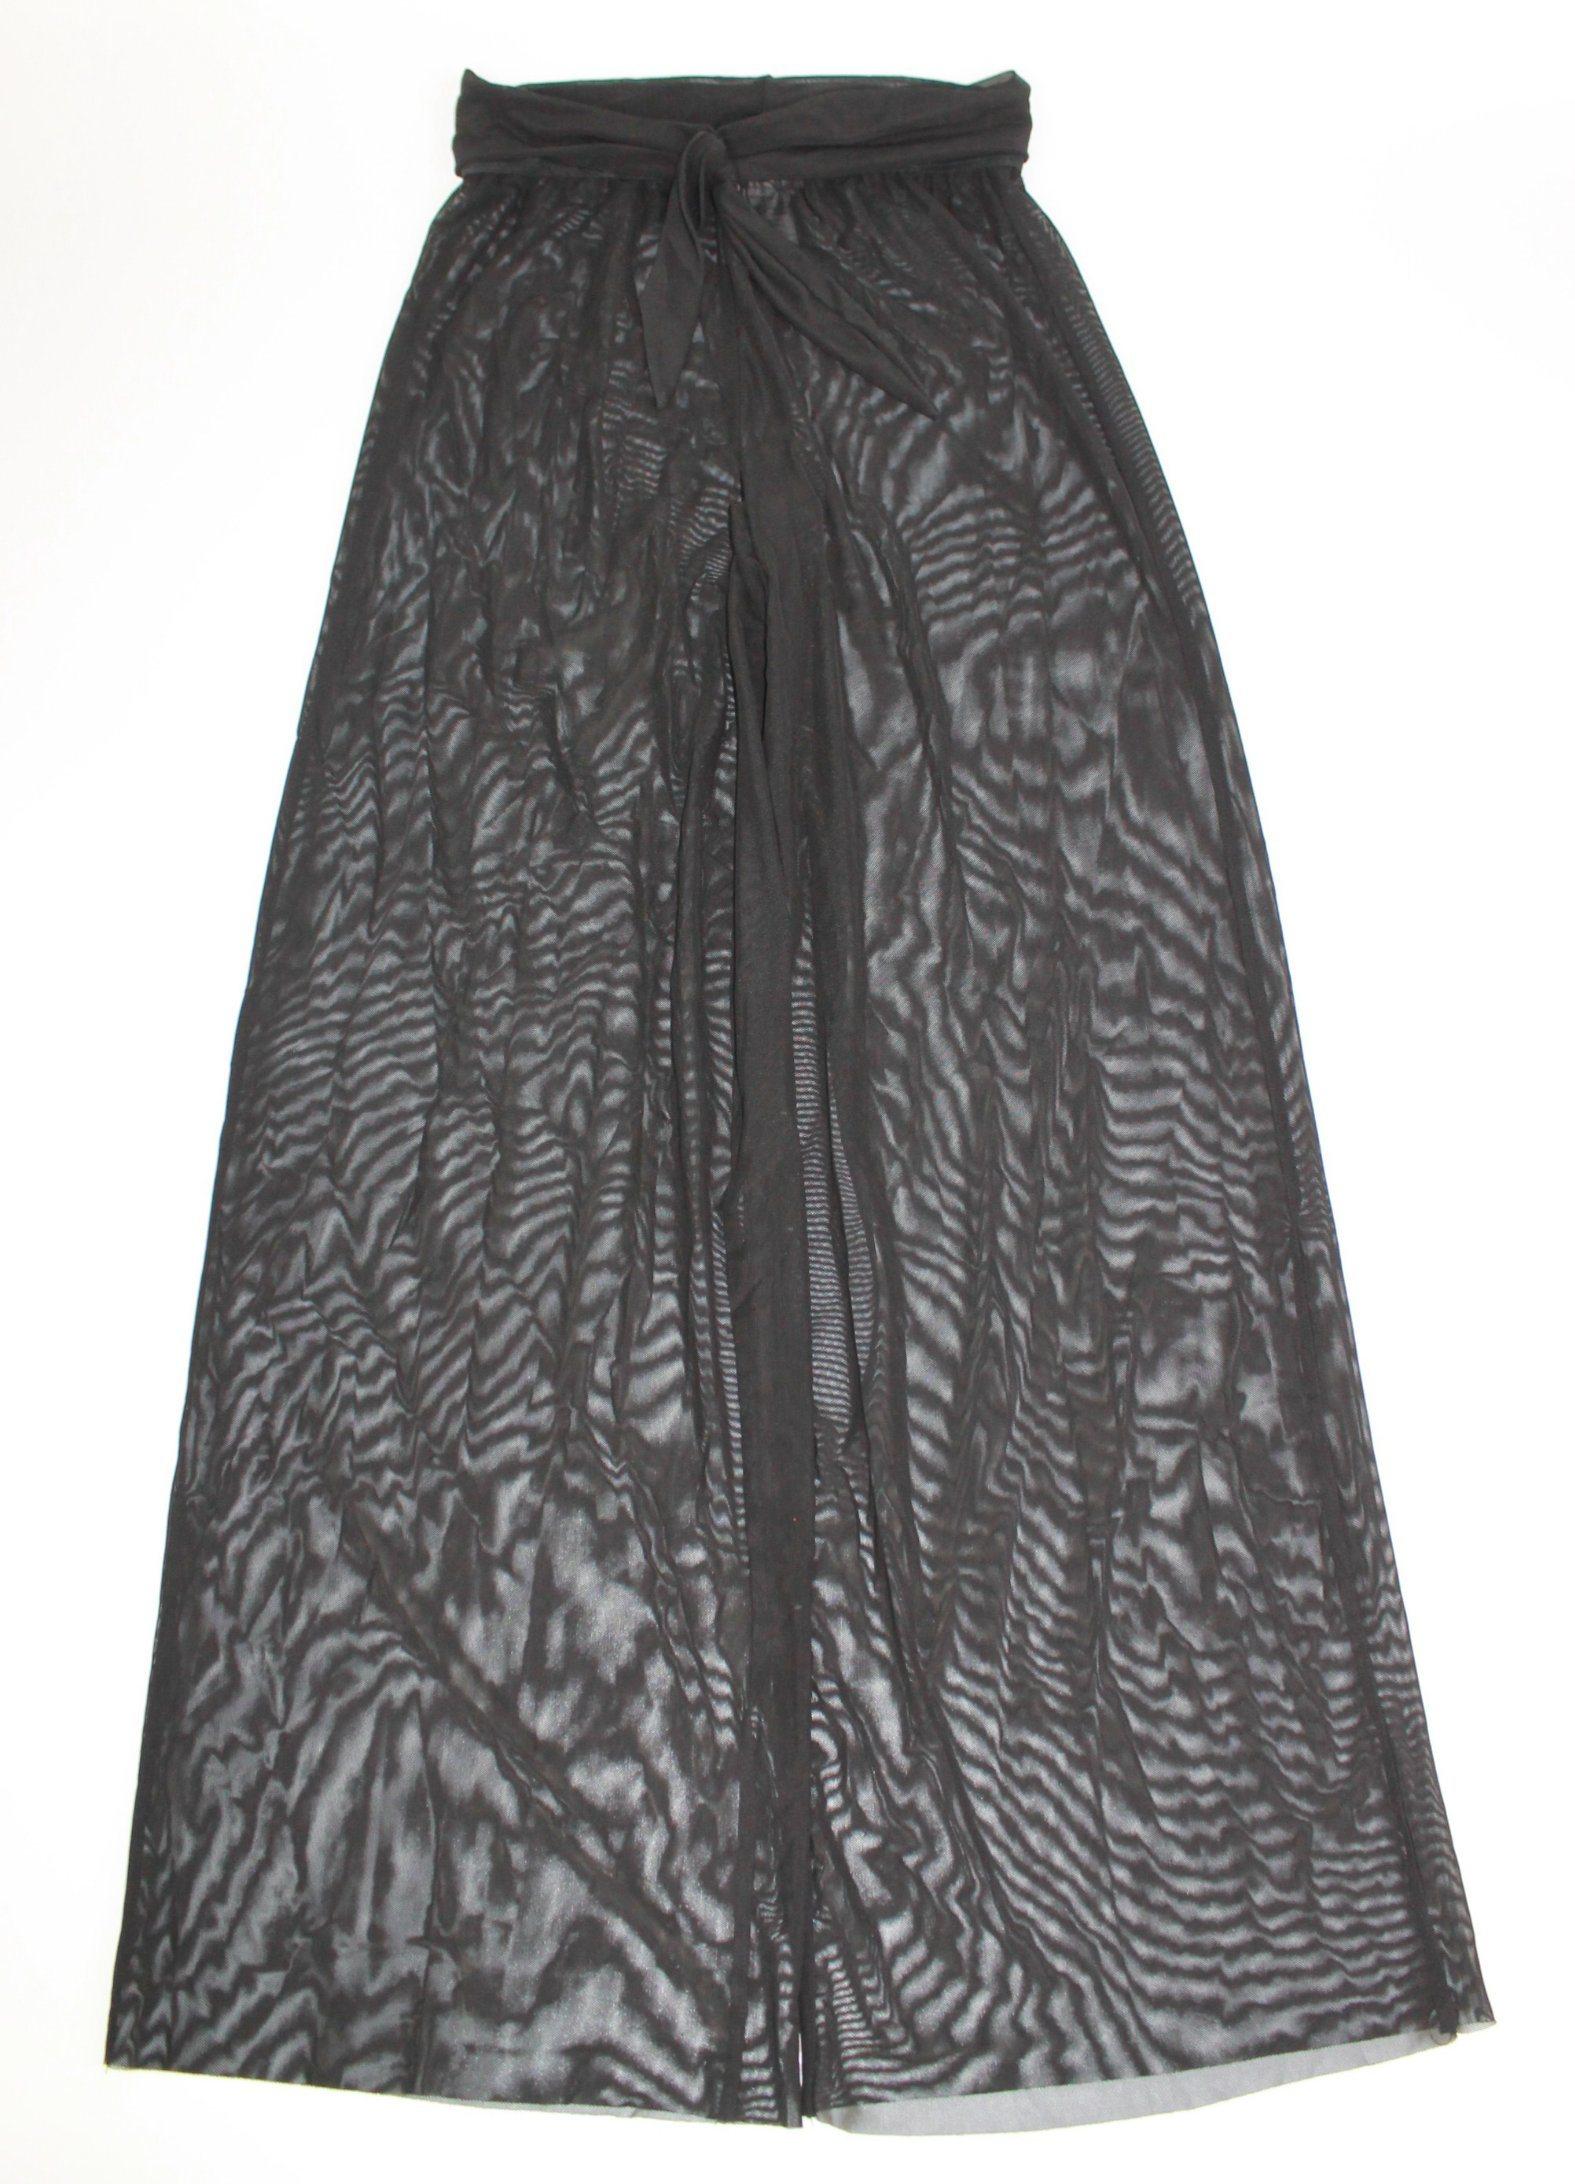 Women′s Swimwear Dress Made of Sexy 100% Polyester Mesh Fabric